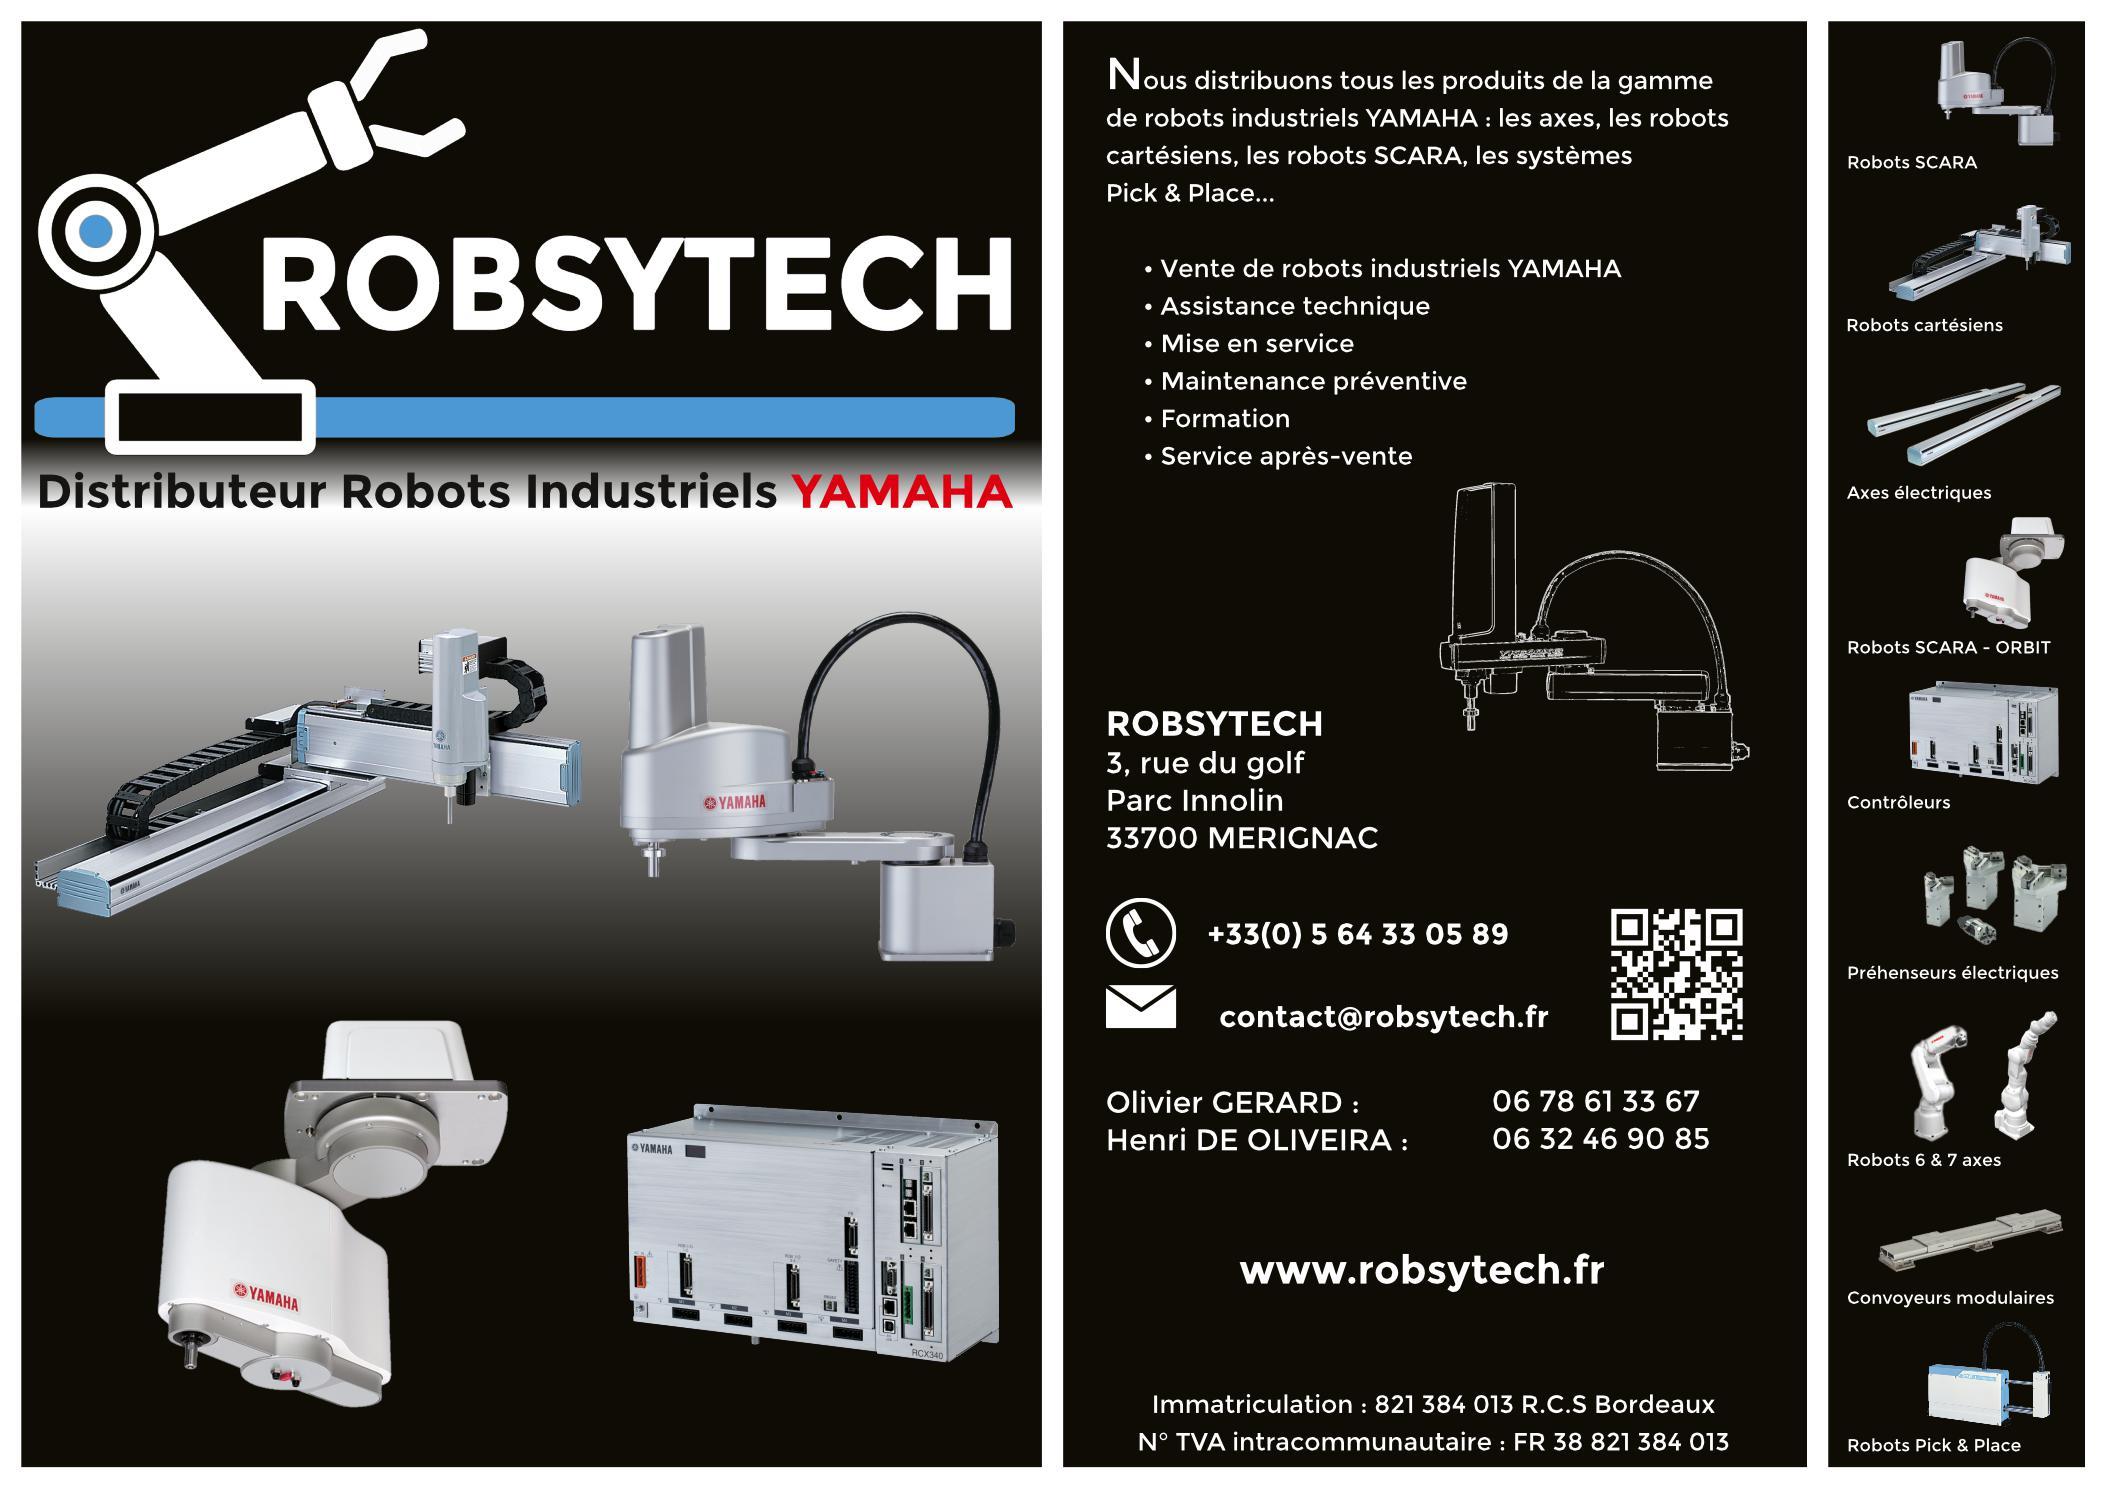 photo - ROBSYTECH